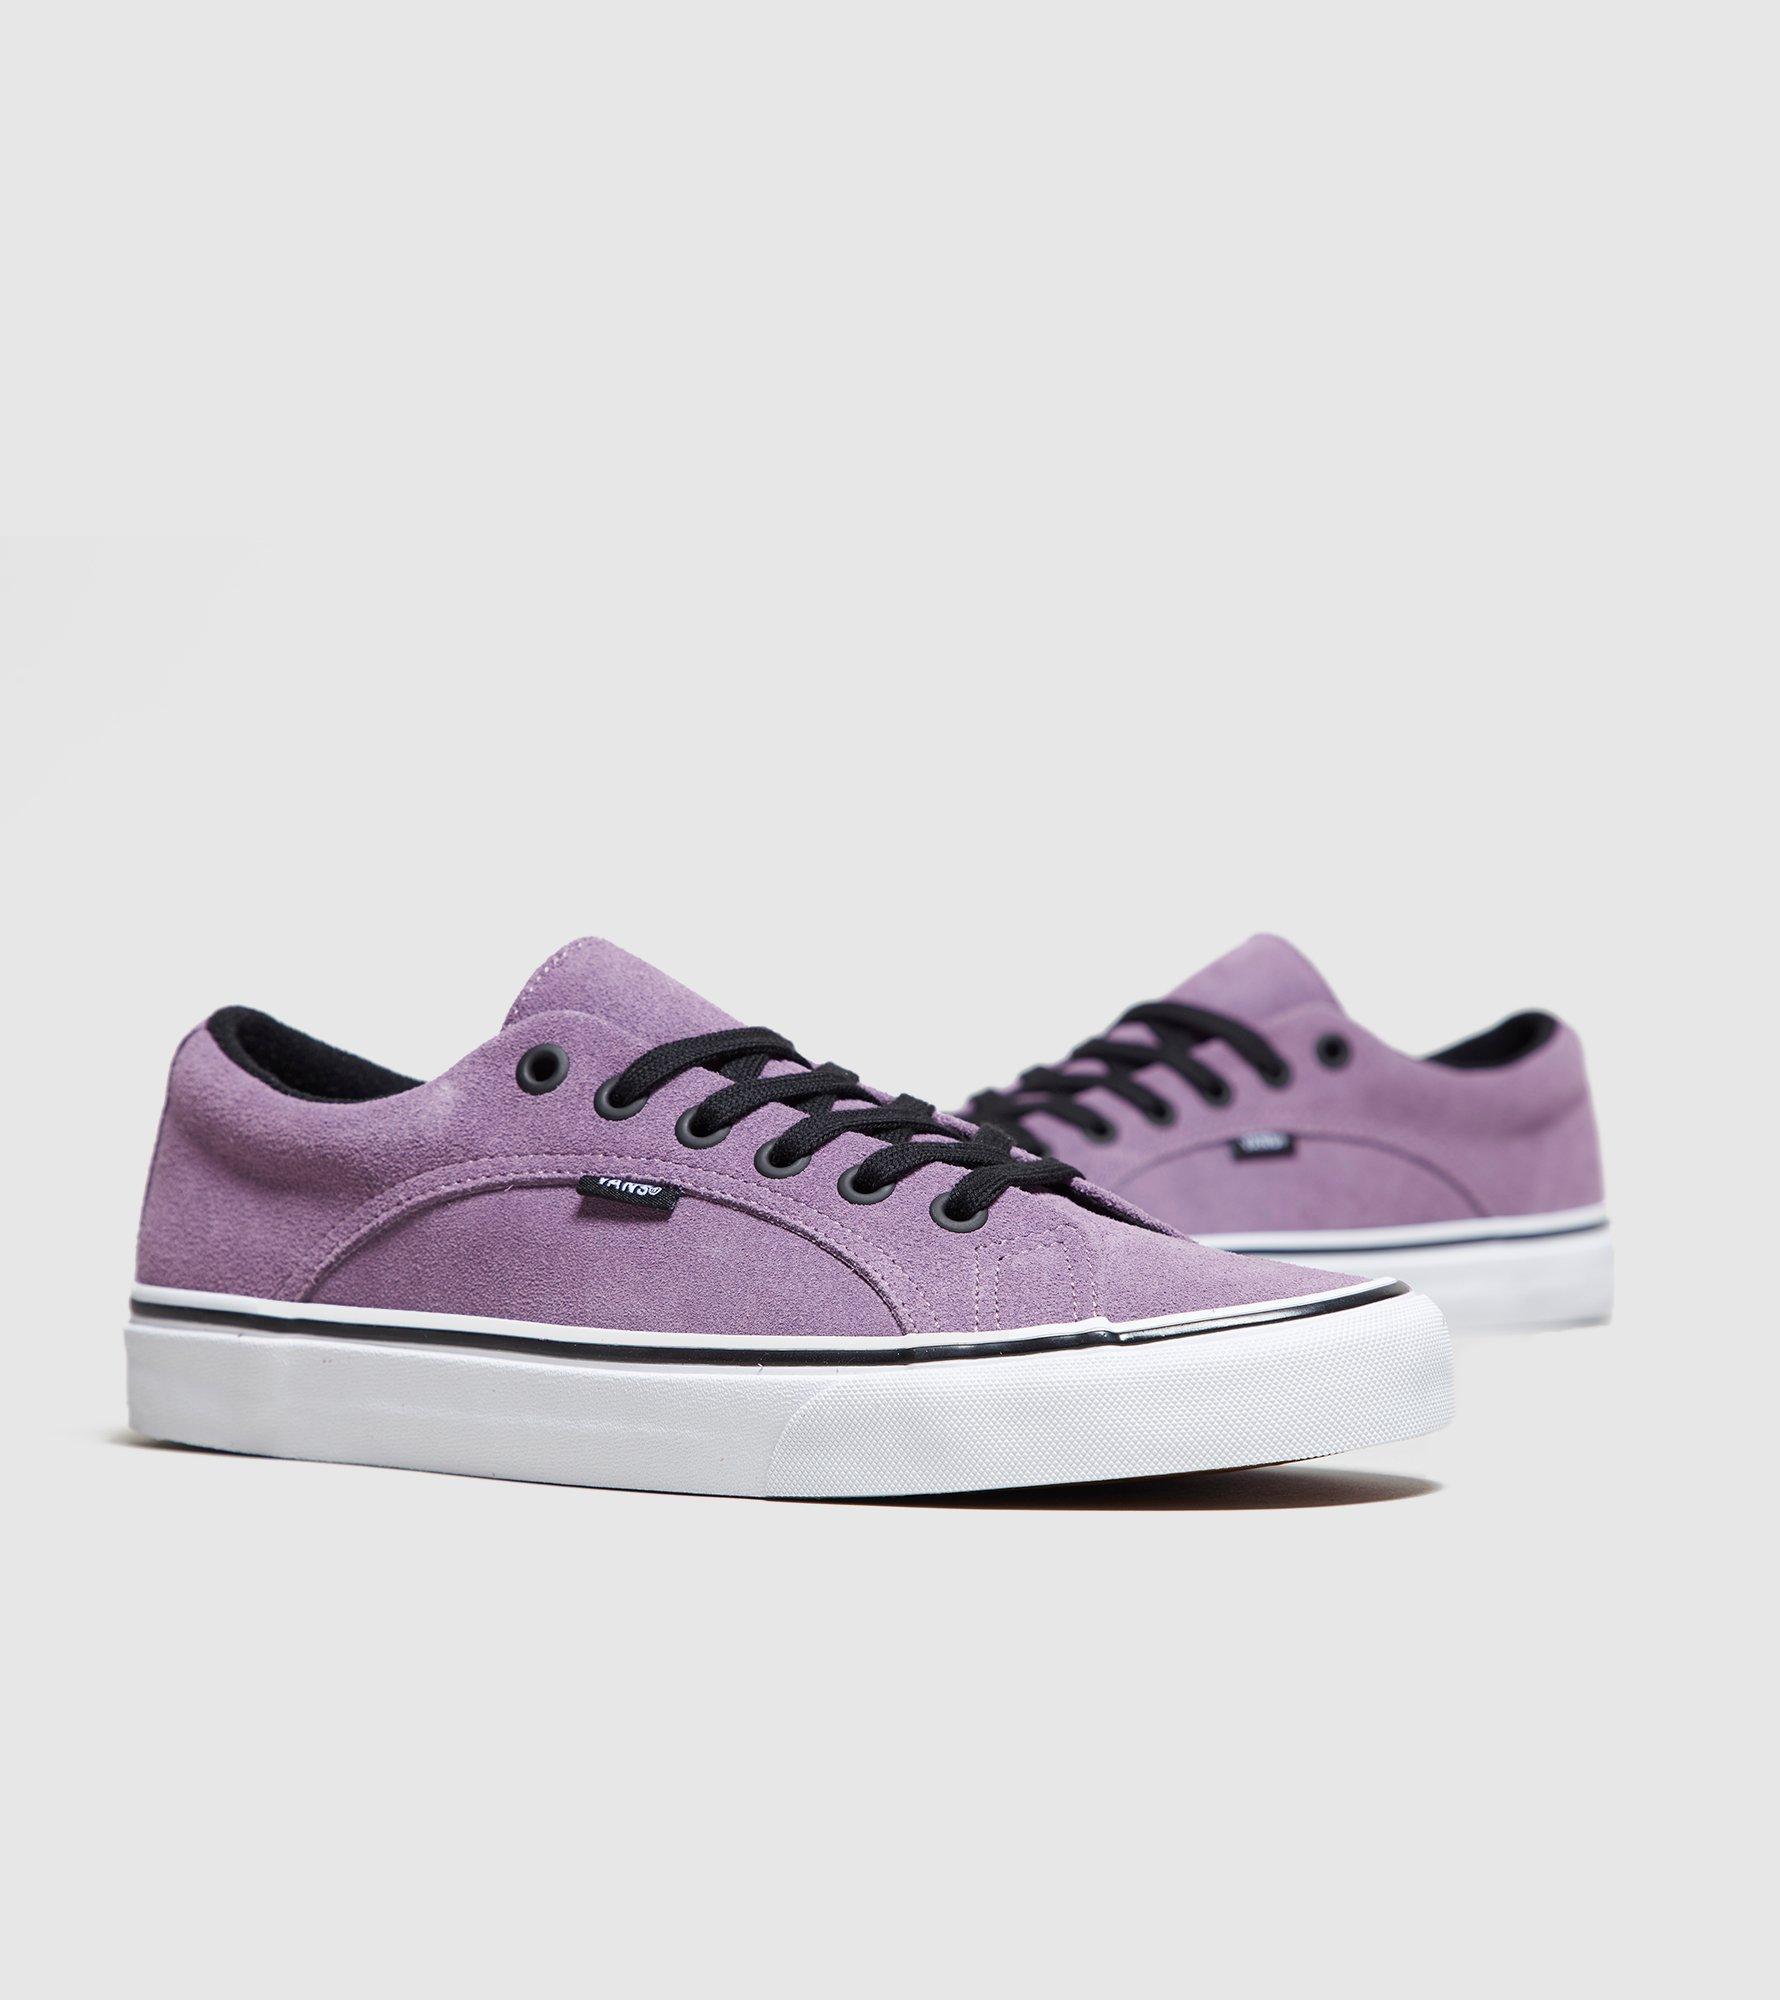 c13258951f07 Lyst - Vans Lampin in Purple for Men